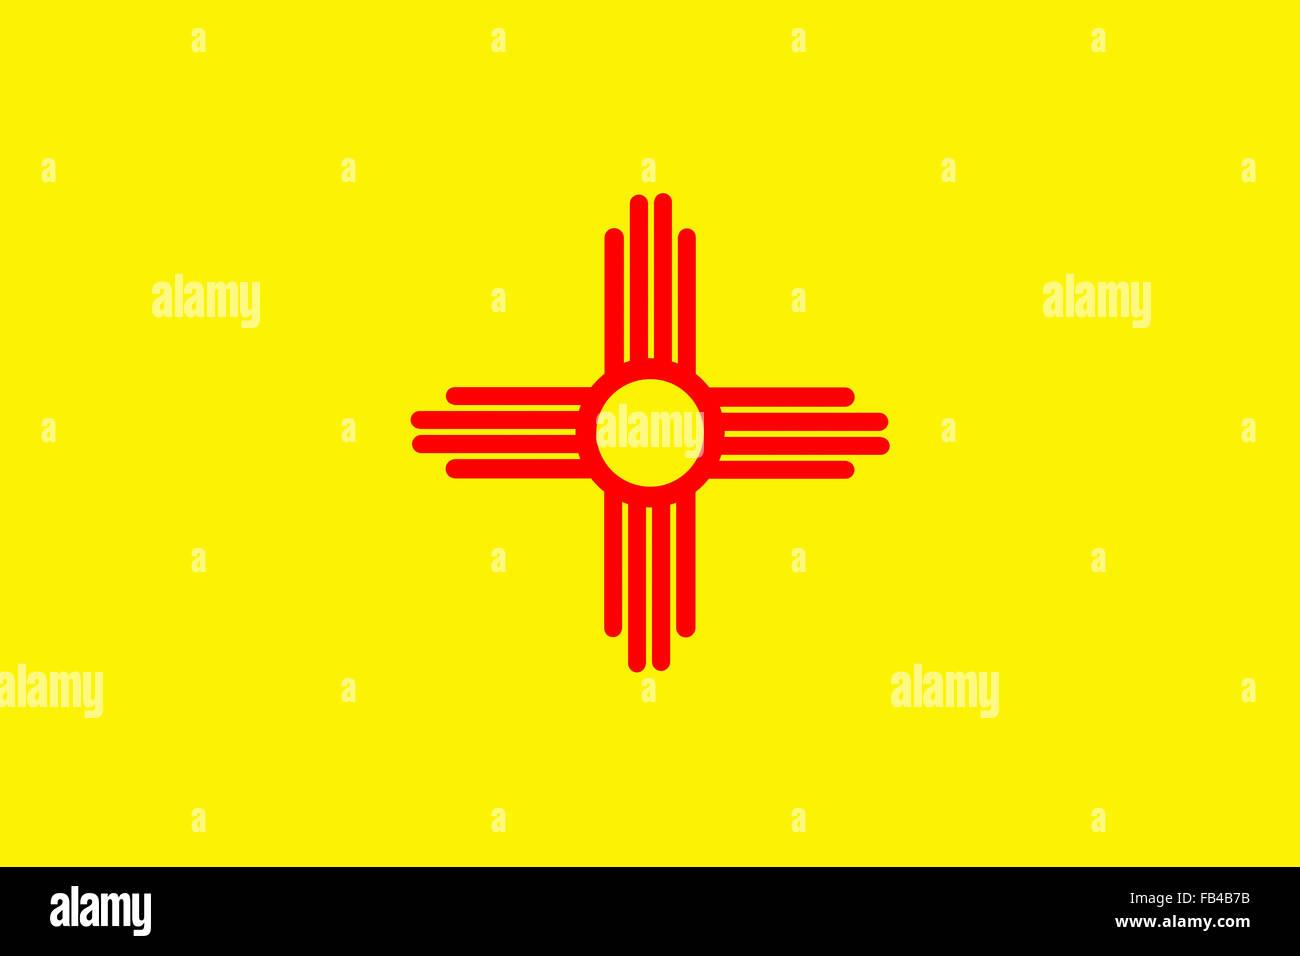 Zia New Mexico Stock Photos Amp Zia New Mexico Stock Images